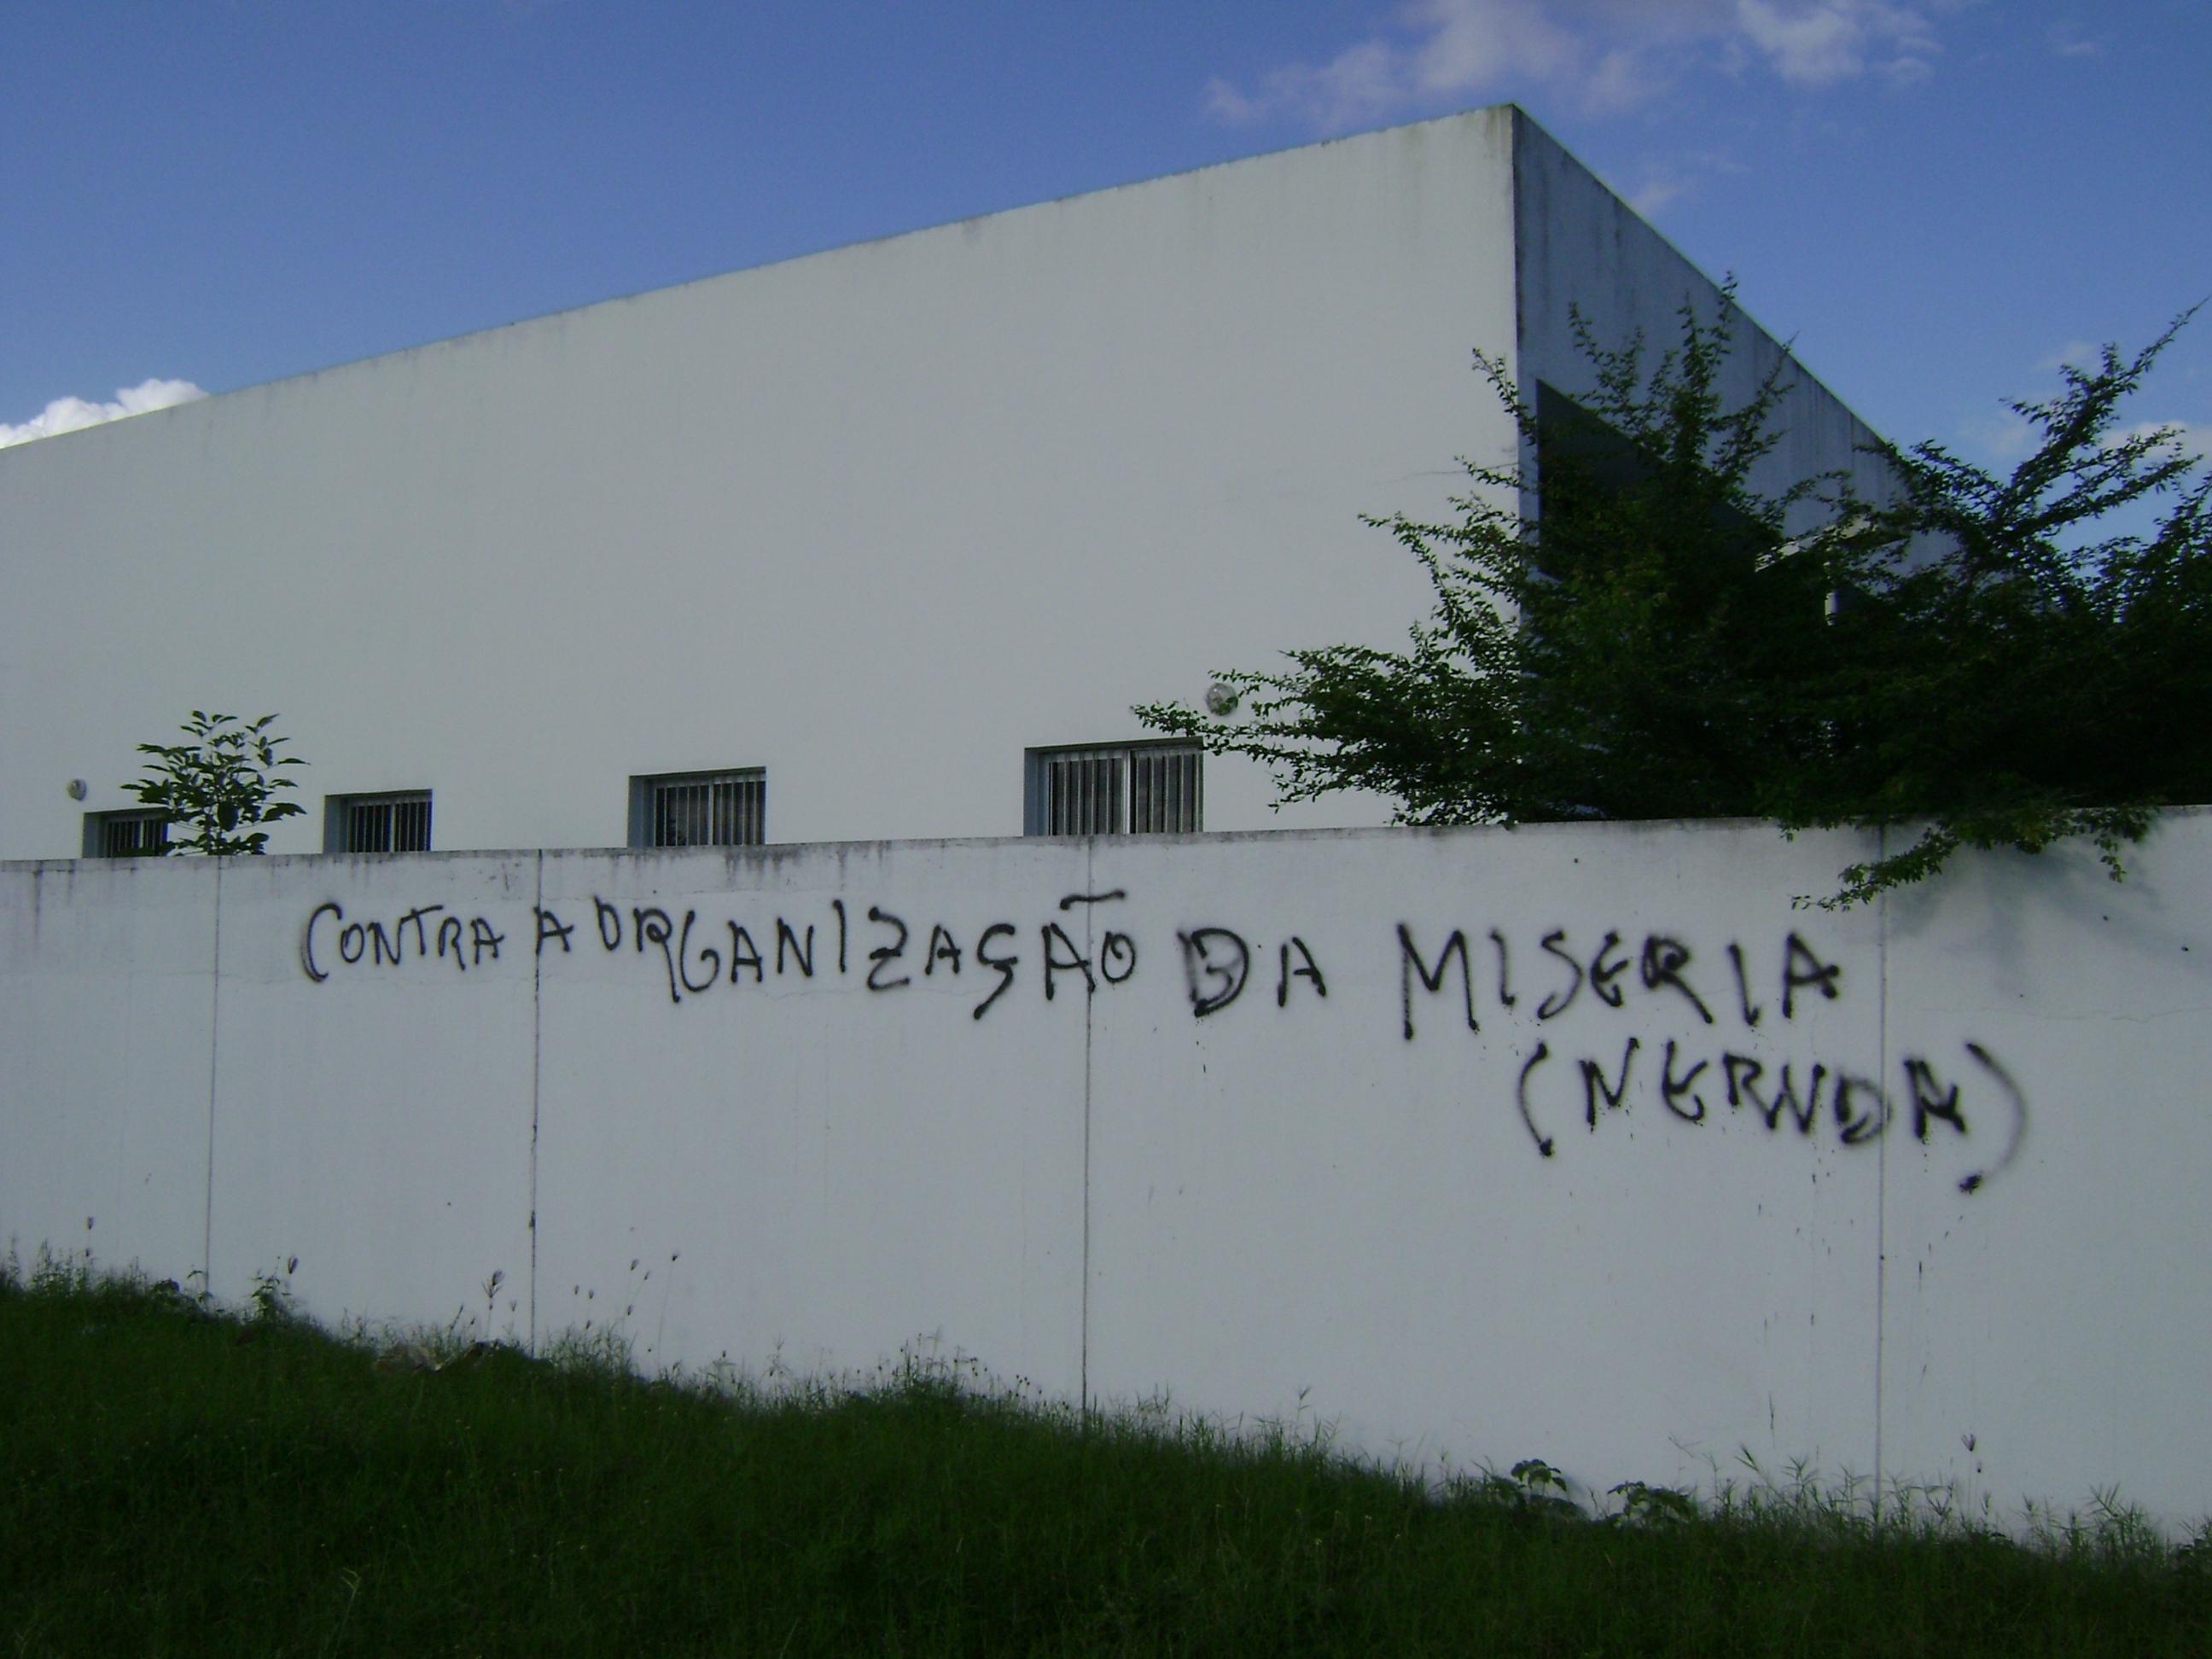 Contra la organización de la miseria (Neruda), asfaltada en Feira de Santana, Bahía, Brasil.